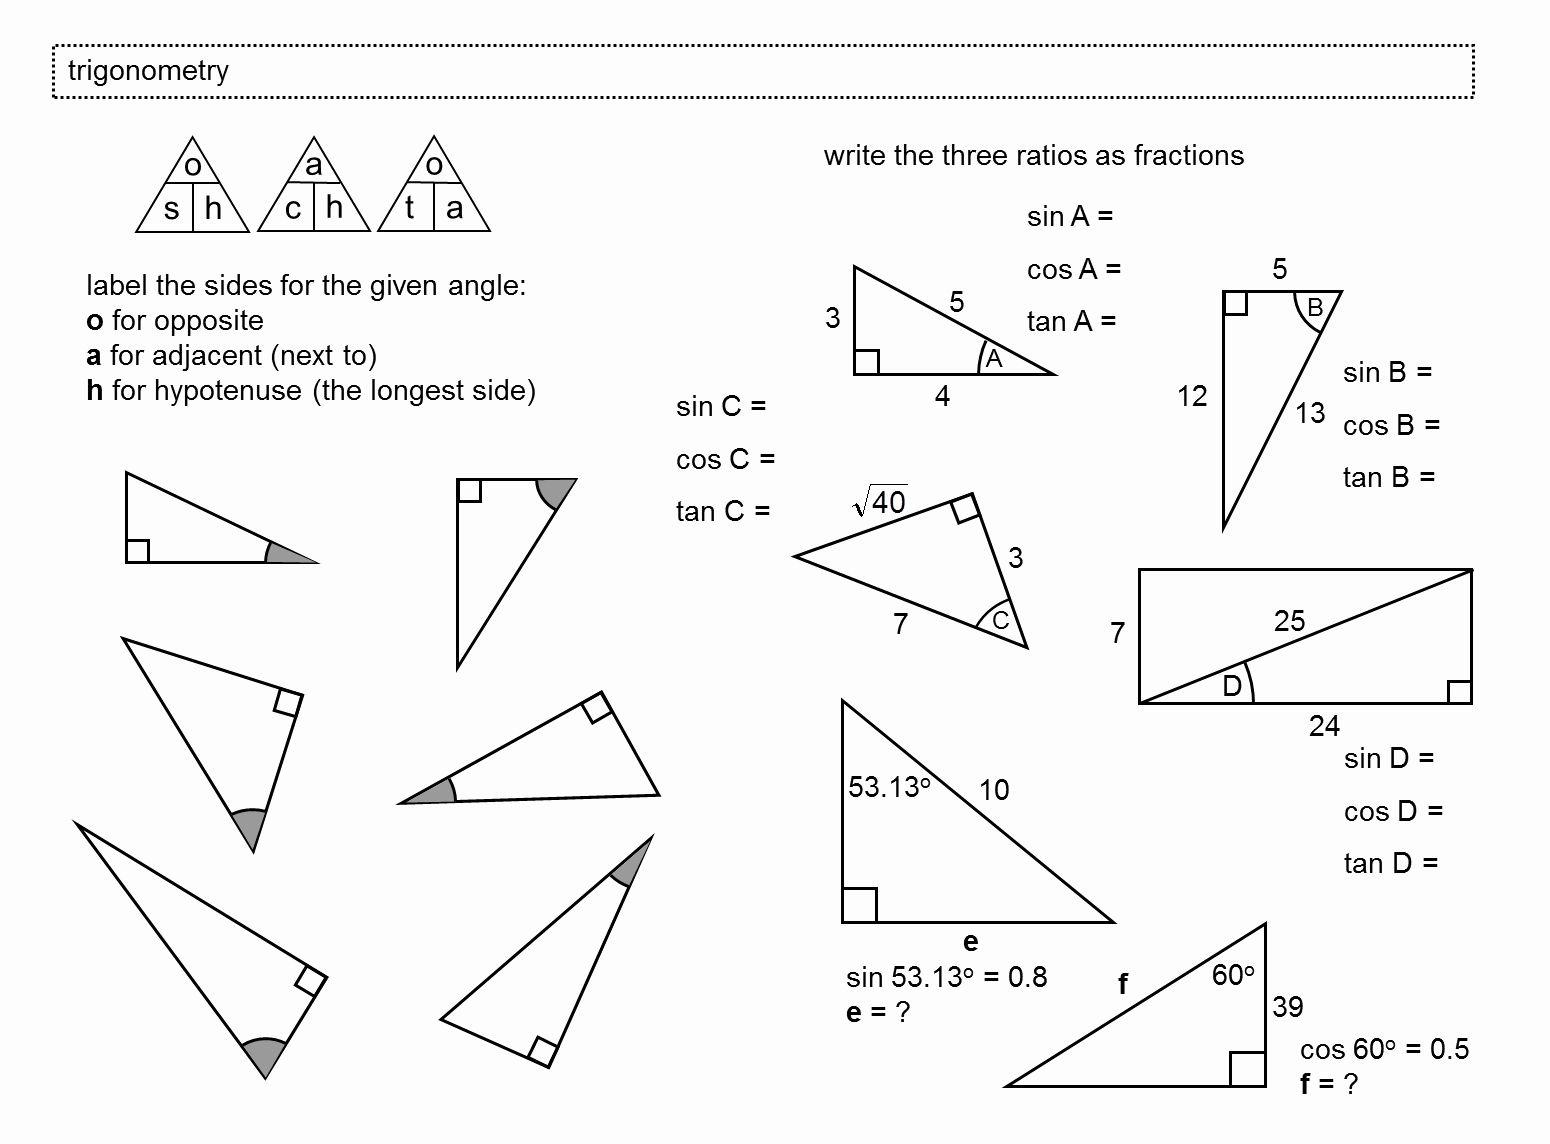 Right Triangle Trigonometry Worksheet Beautiful Median Don Steward Mathematics Teaching Trigonometry In 2020 Geometry Worksheets Trigonometry Worksheets Trigonometry